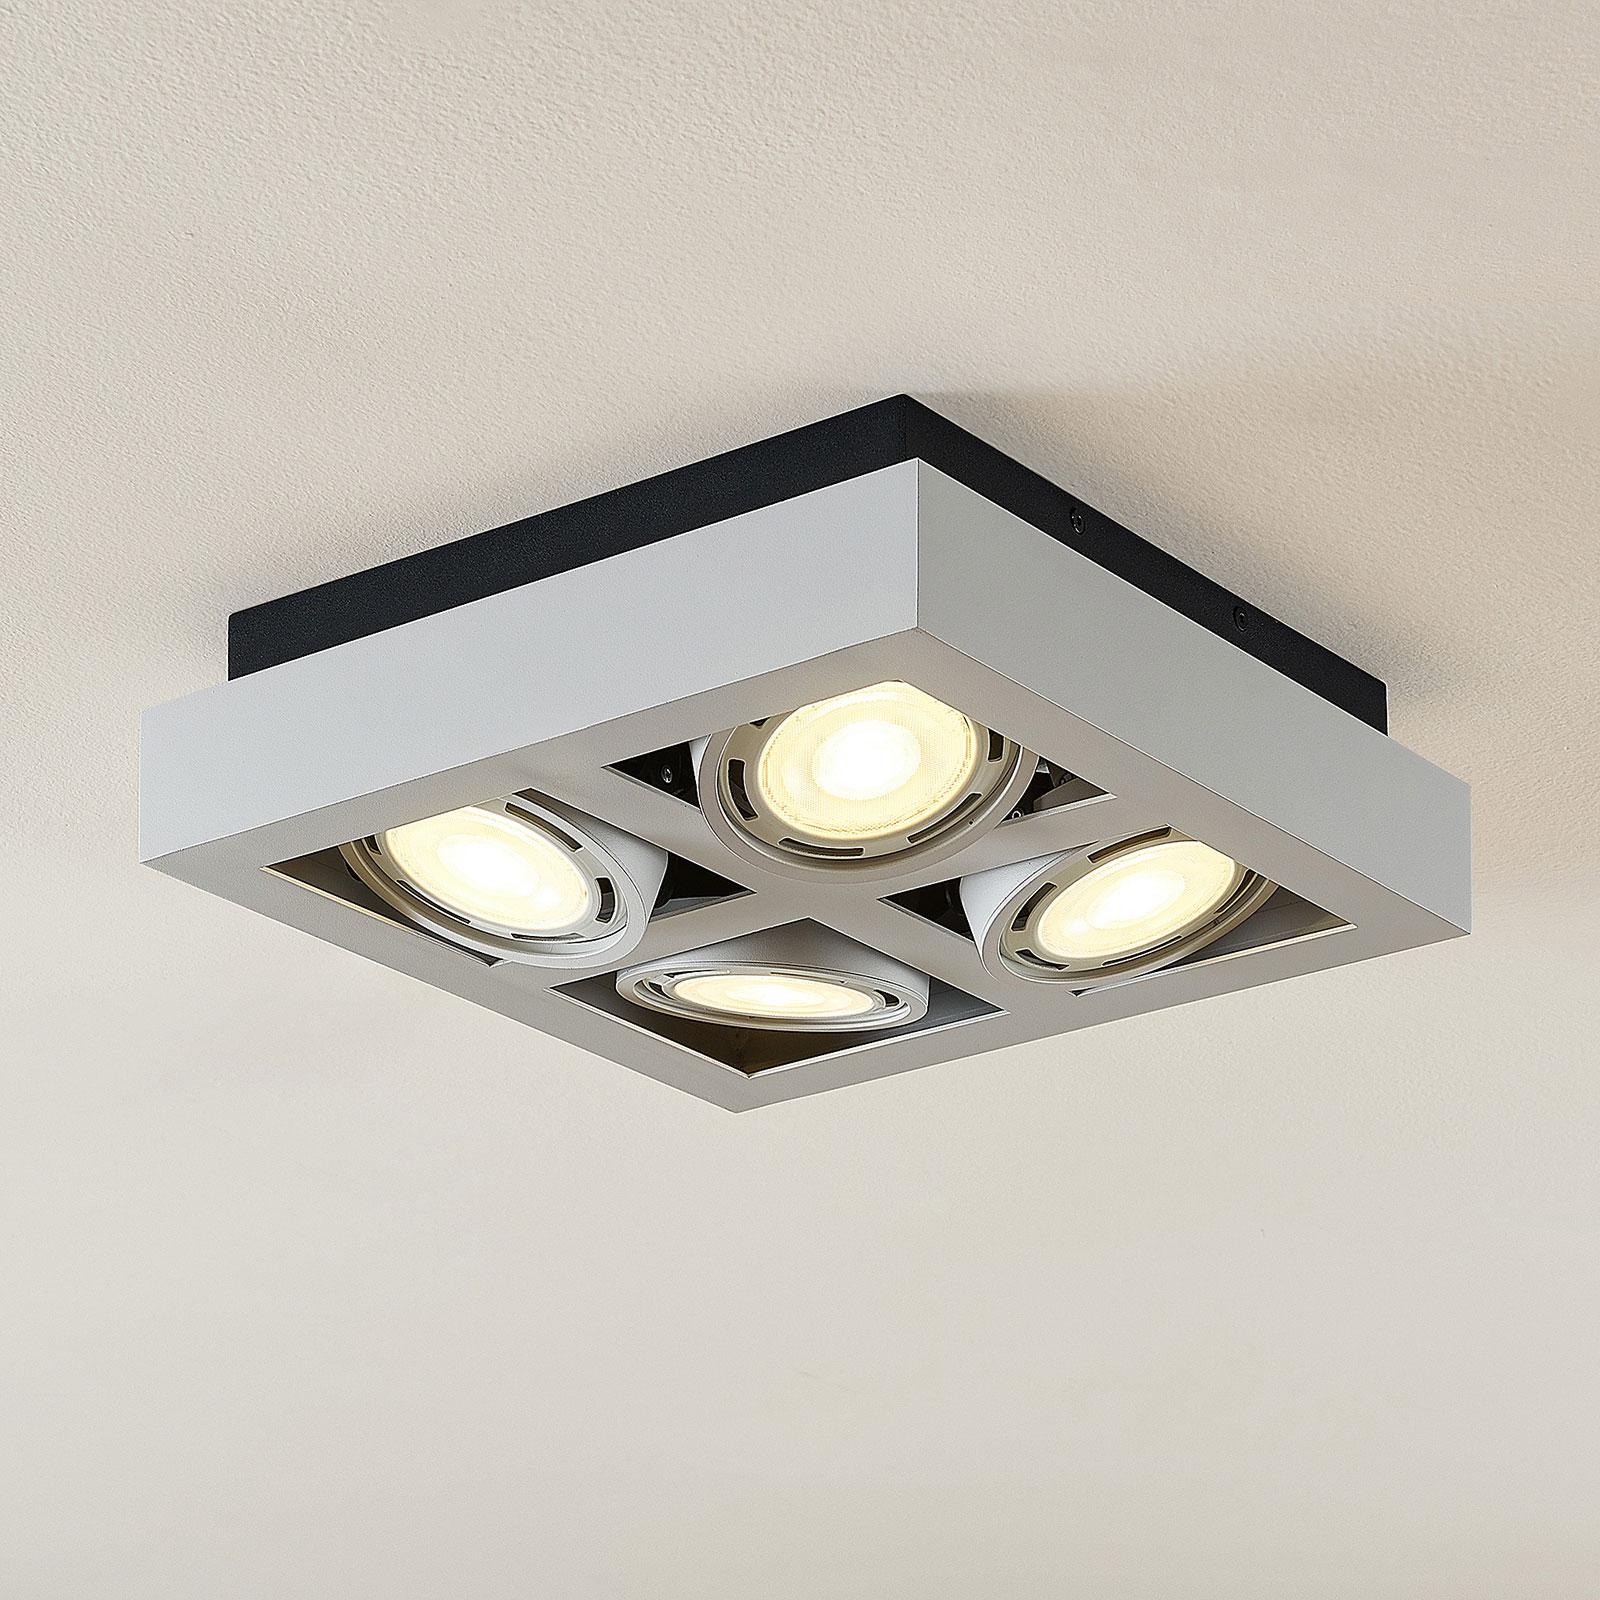 LED-takspot Ronka, 4 lyskilder, kvadratisk, hvit